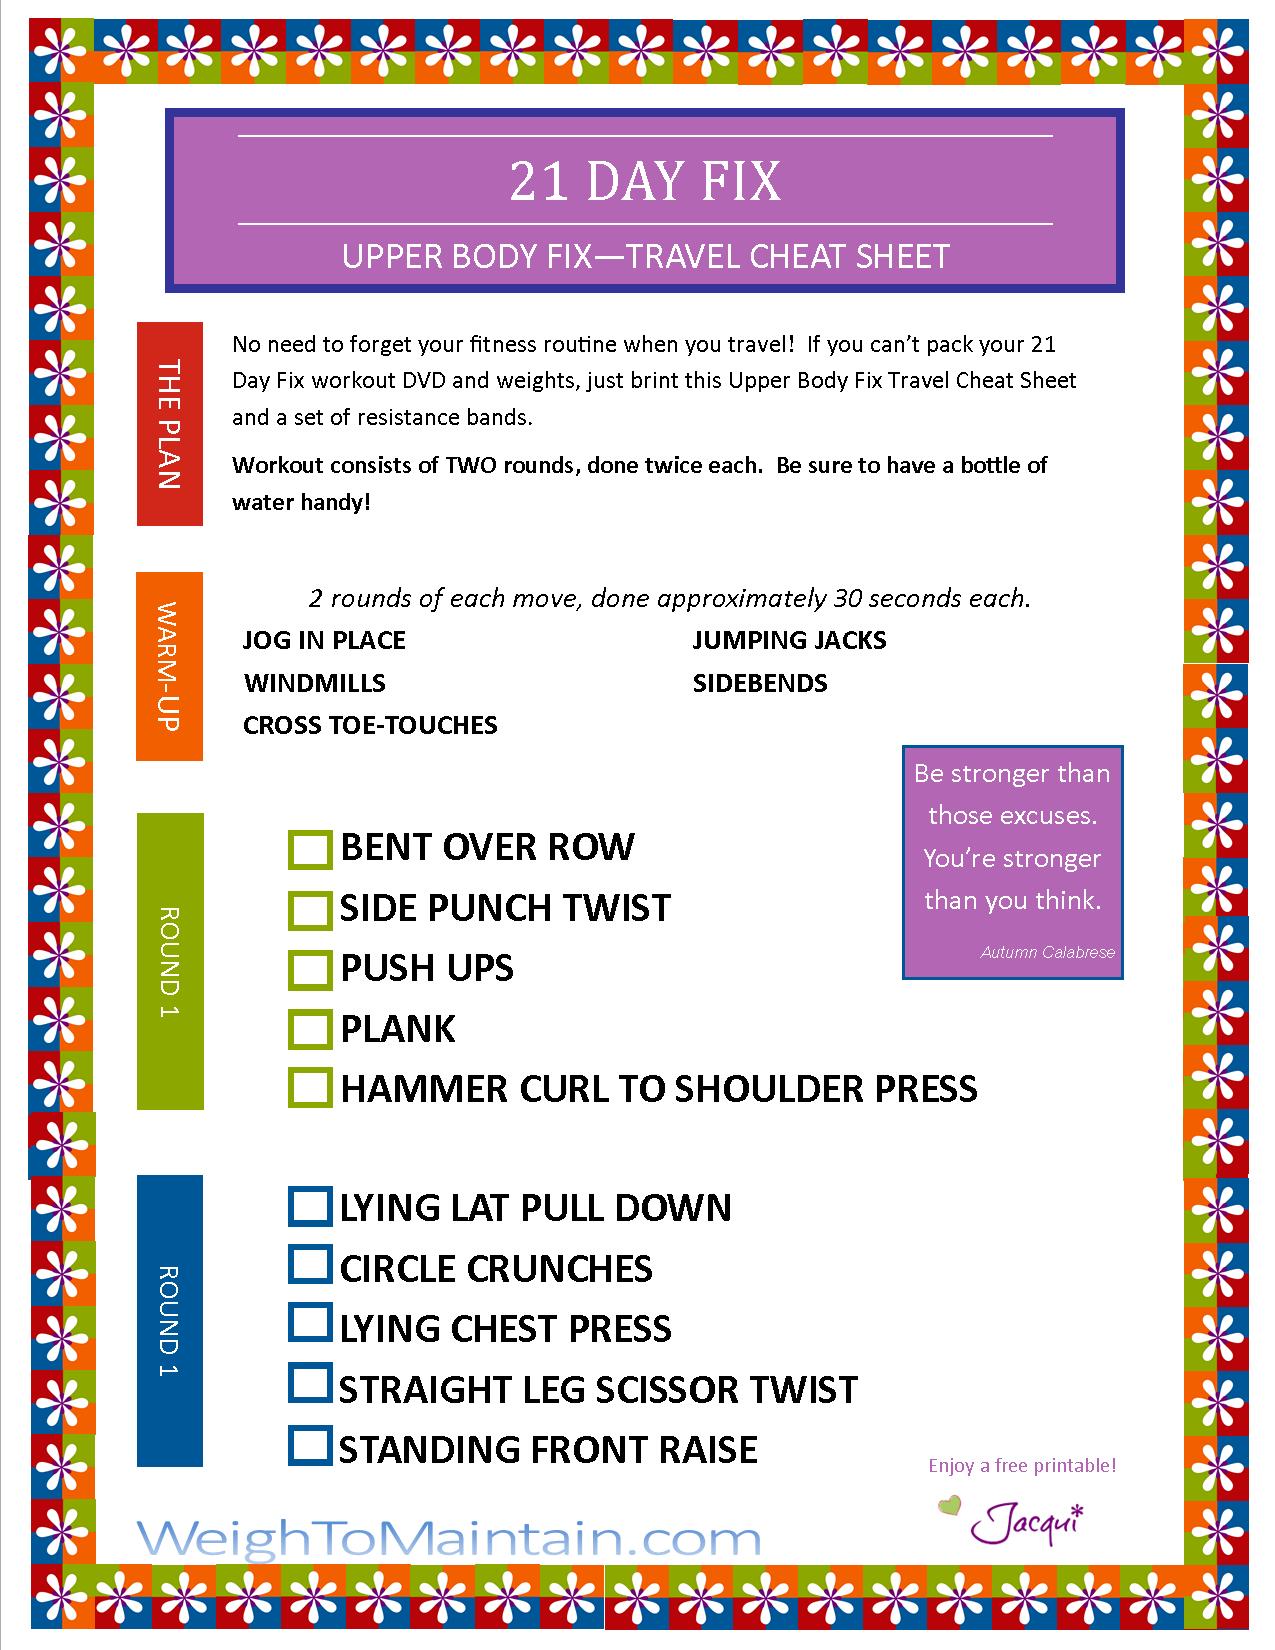 21 Day Fix Upper Body Fix Workout Pdf Travel Cheat Sheet Plan A Healthy Life 21 Day Fix Workouts 21 Day Fix Diet Beachbody 21 Day Fix